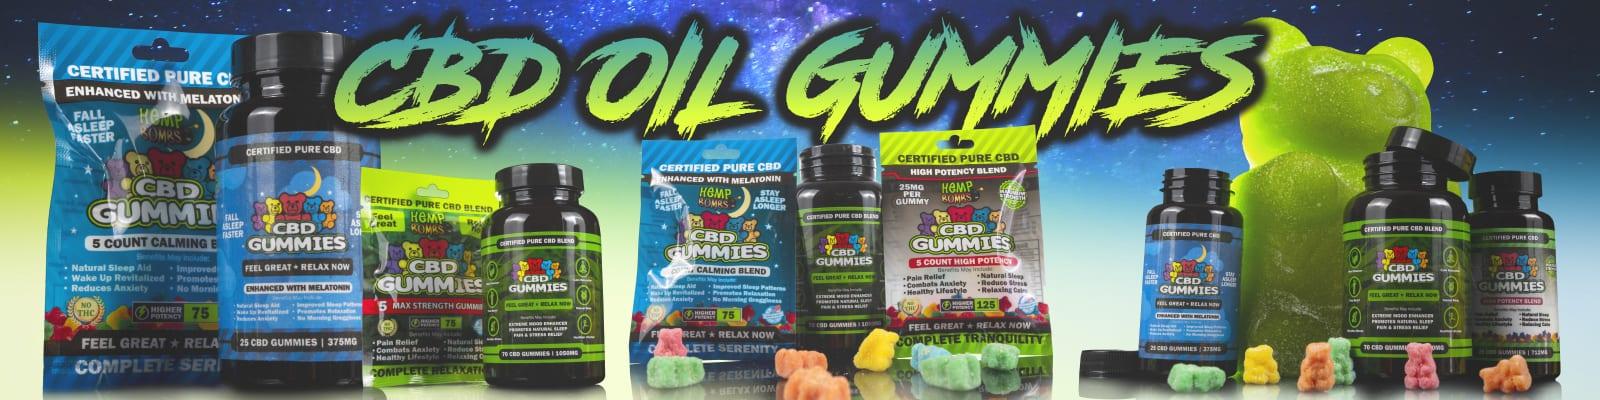 CBD Oil Gummies